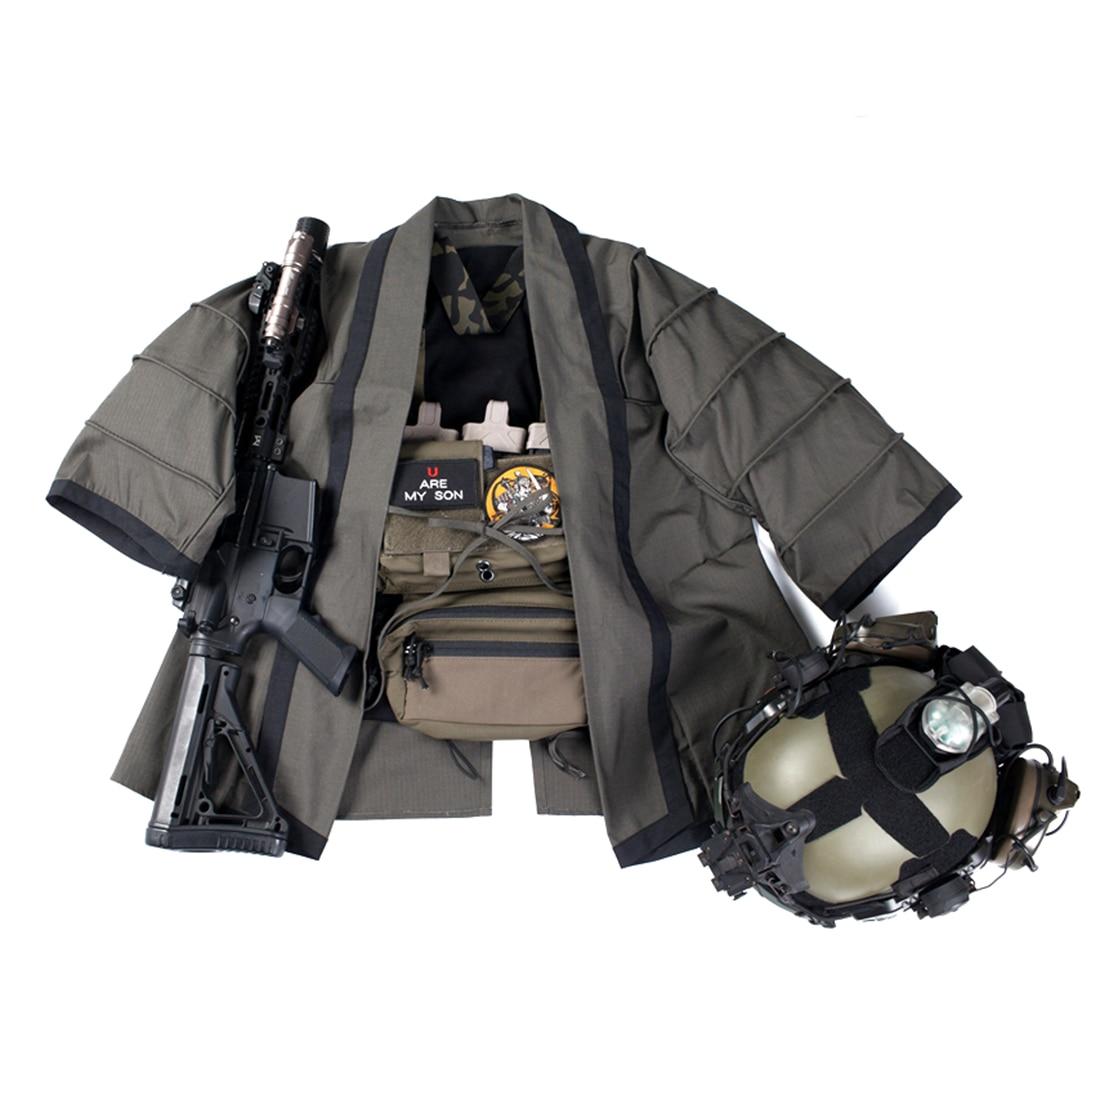 NewBACRAFT, abrigo táctico para exteriores, capa de entrenamiento, chaqueta de combate Haori, humo verde M/L